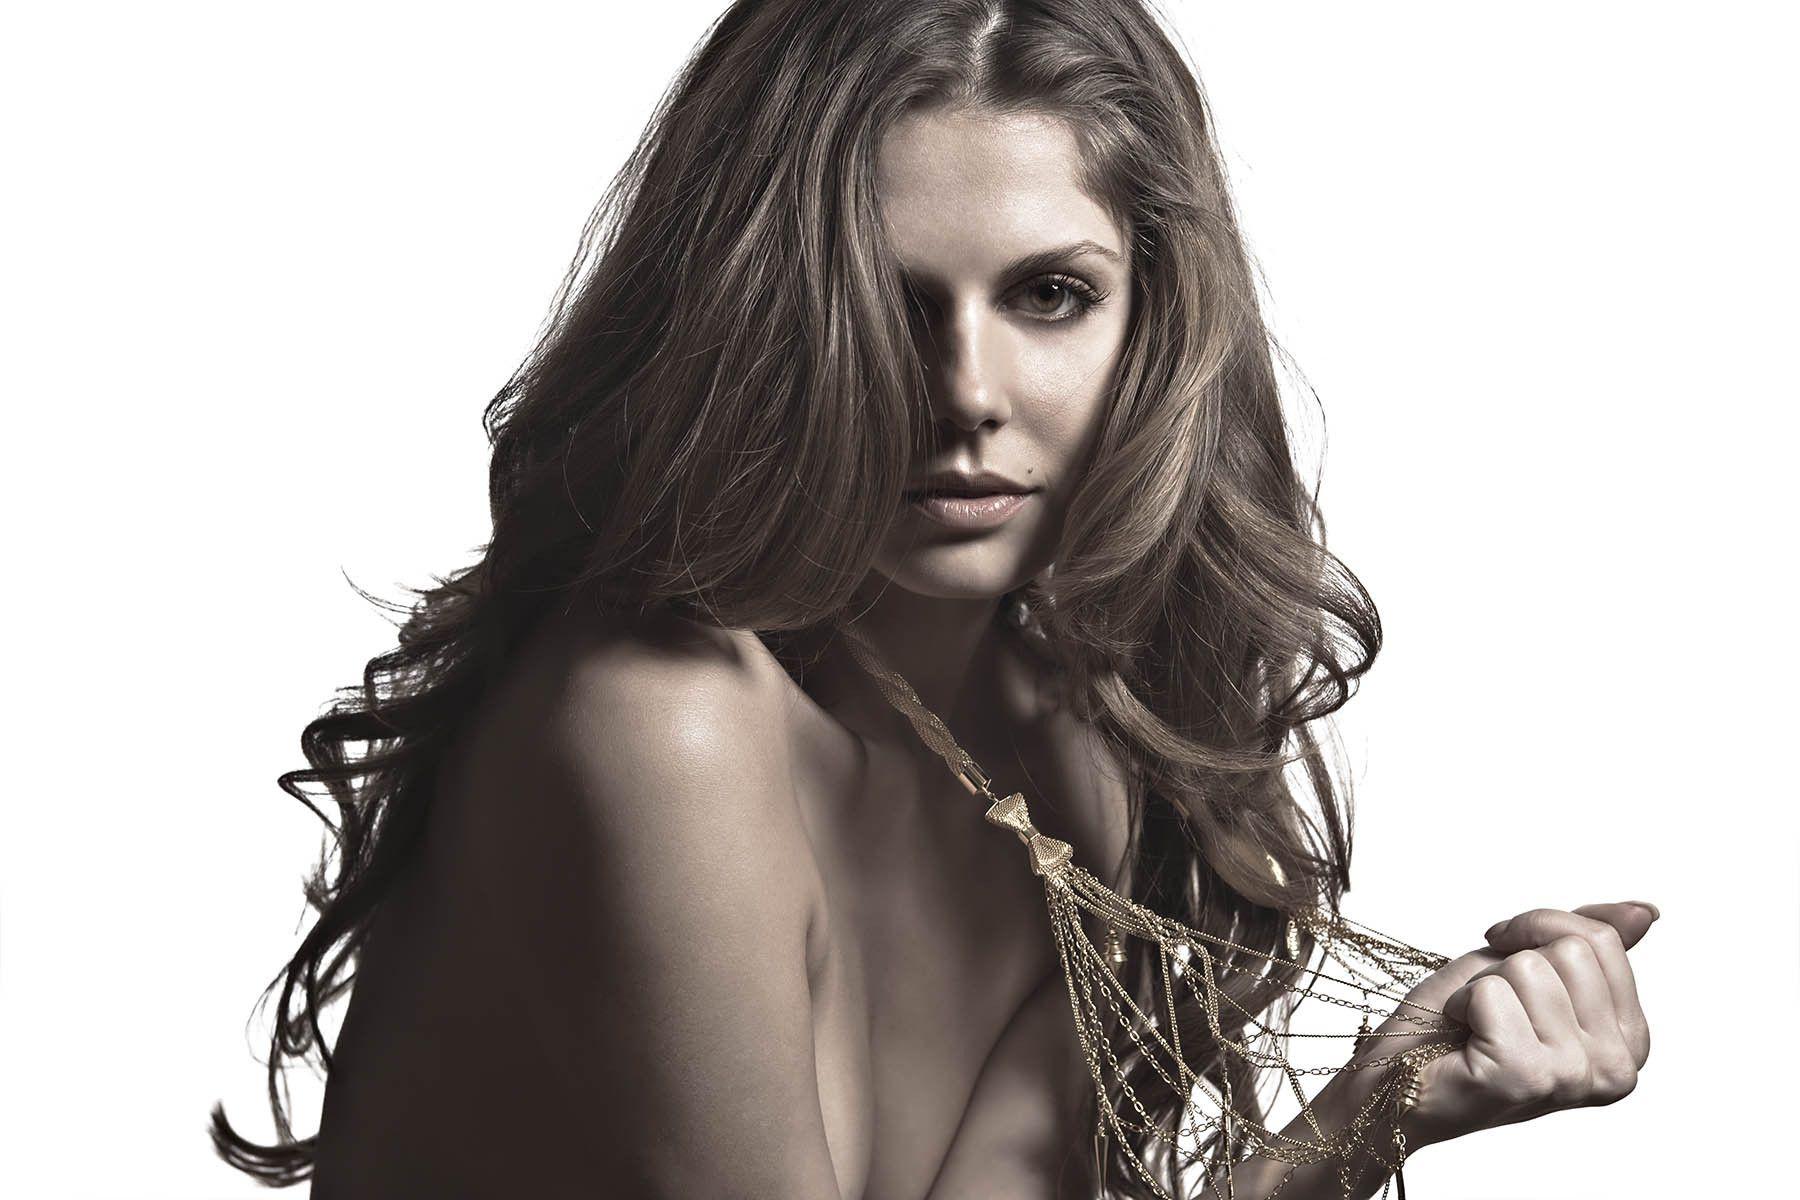 Model: Madlena Kalinova